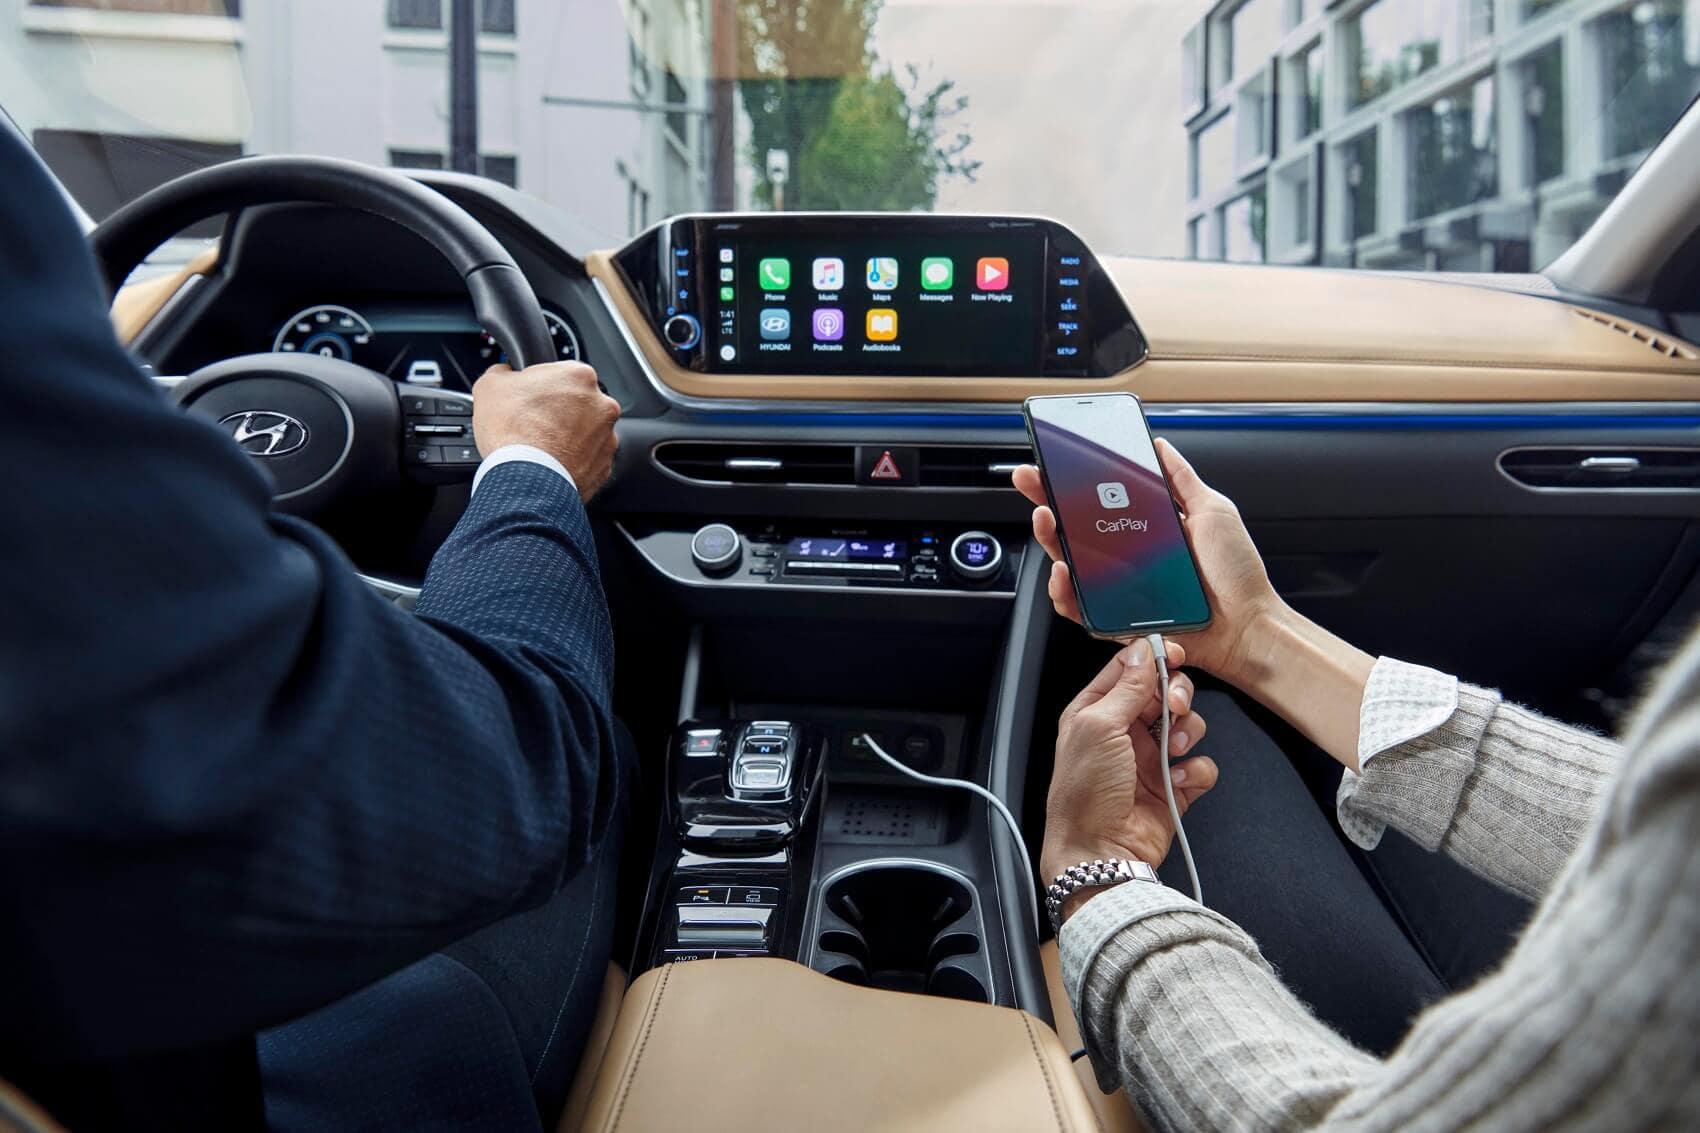 Hyundai Sonata Interior Technology